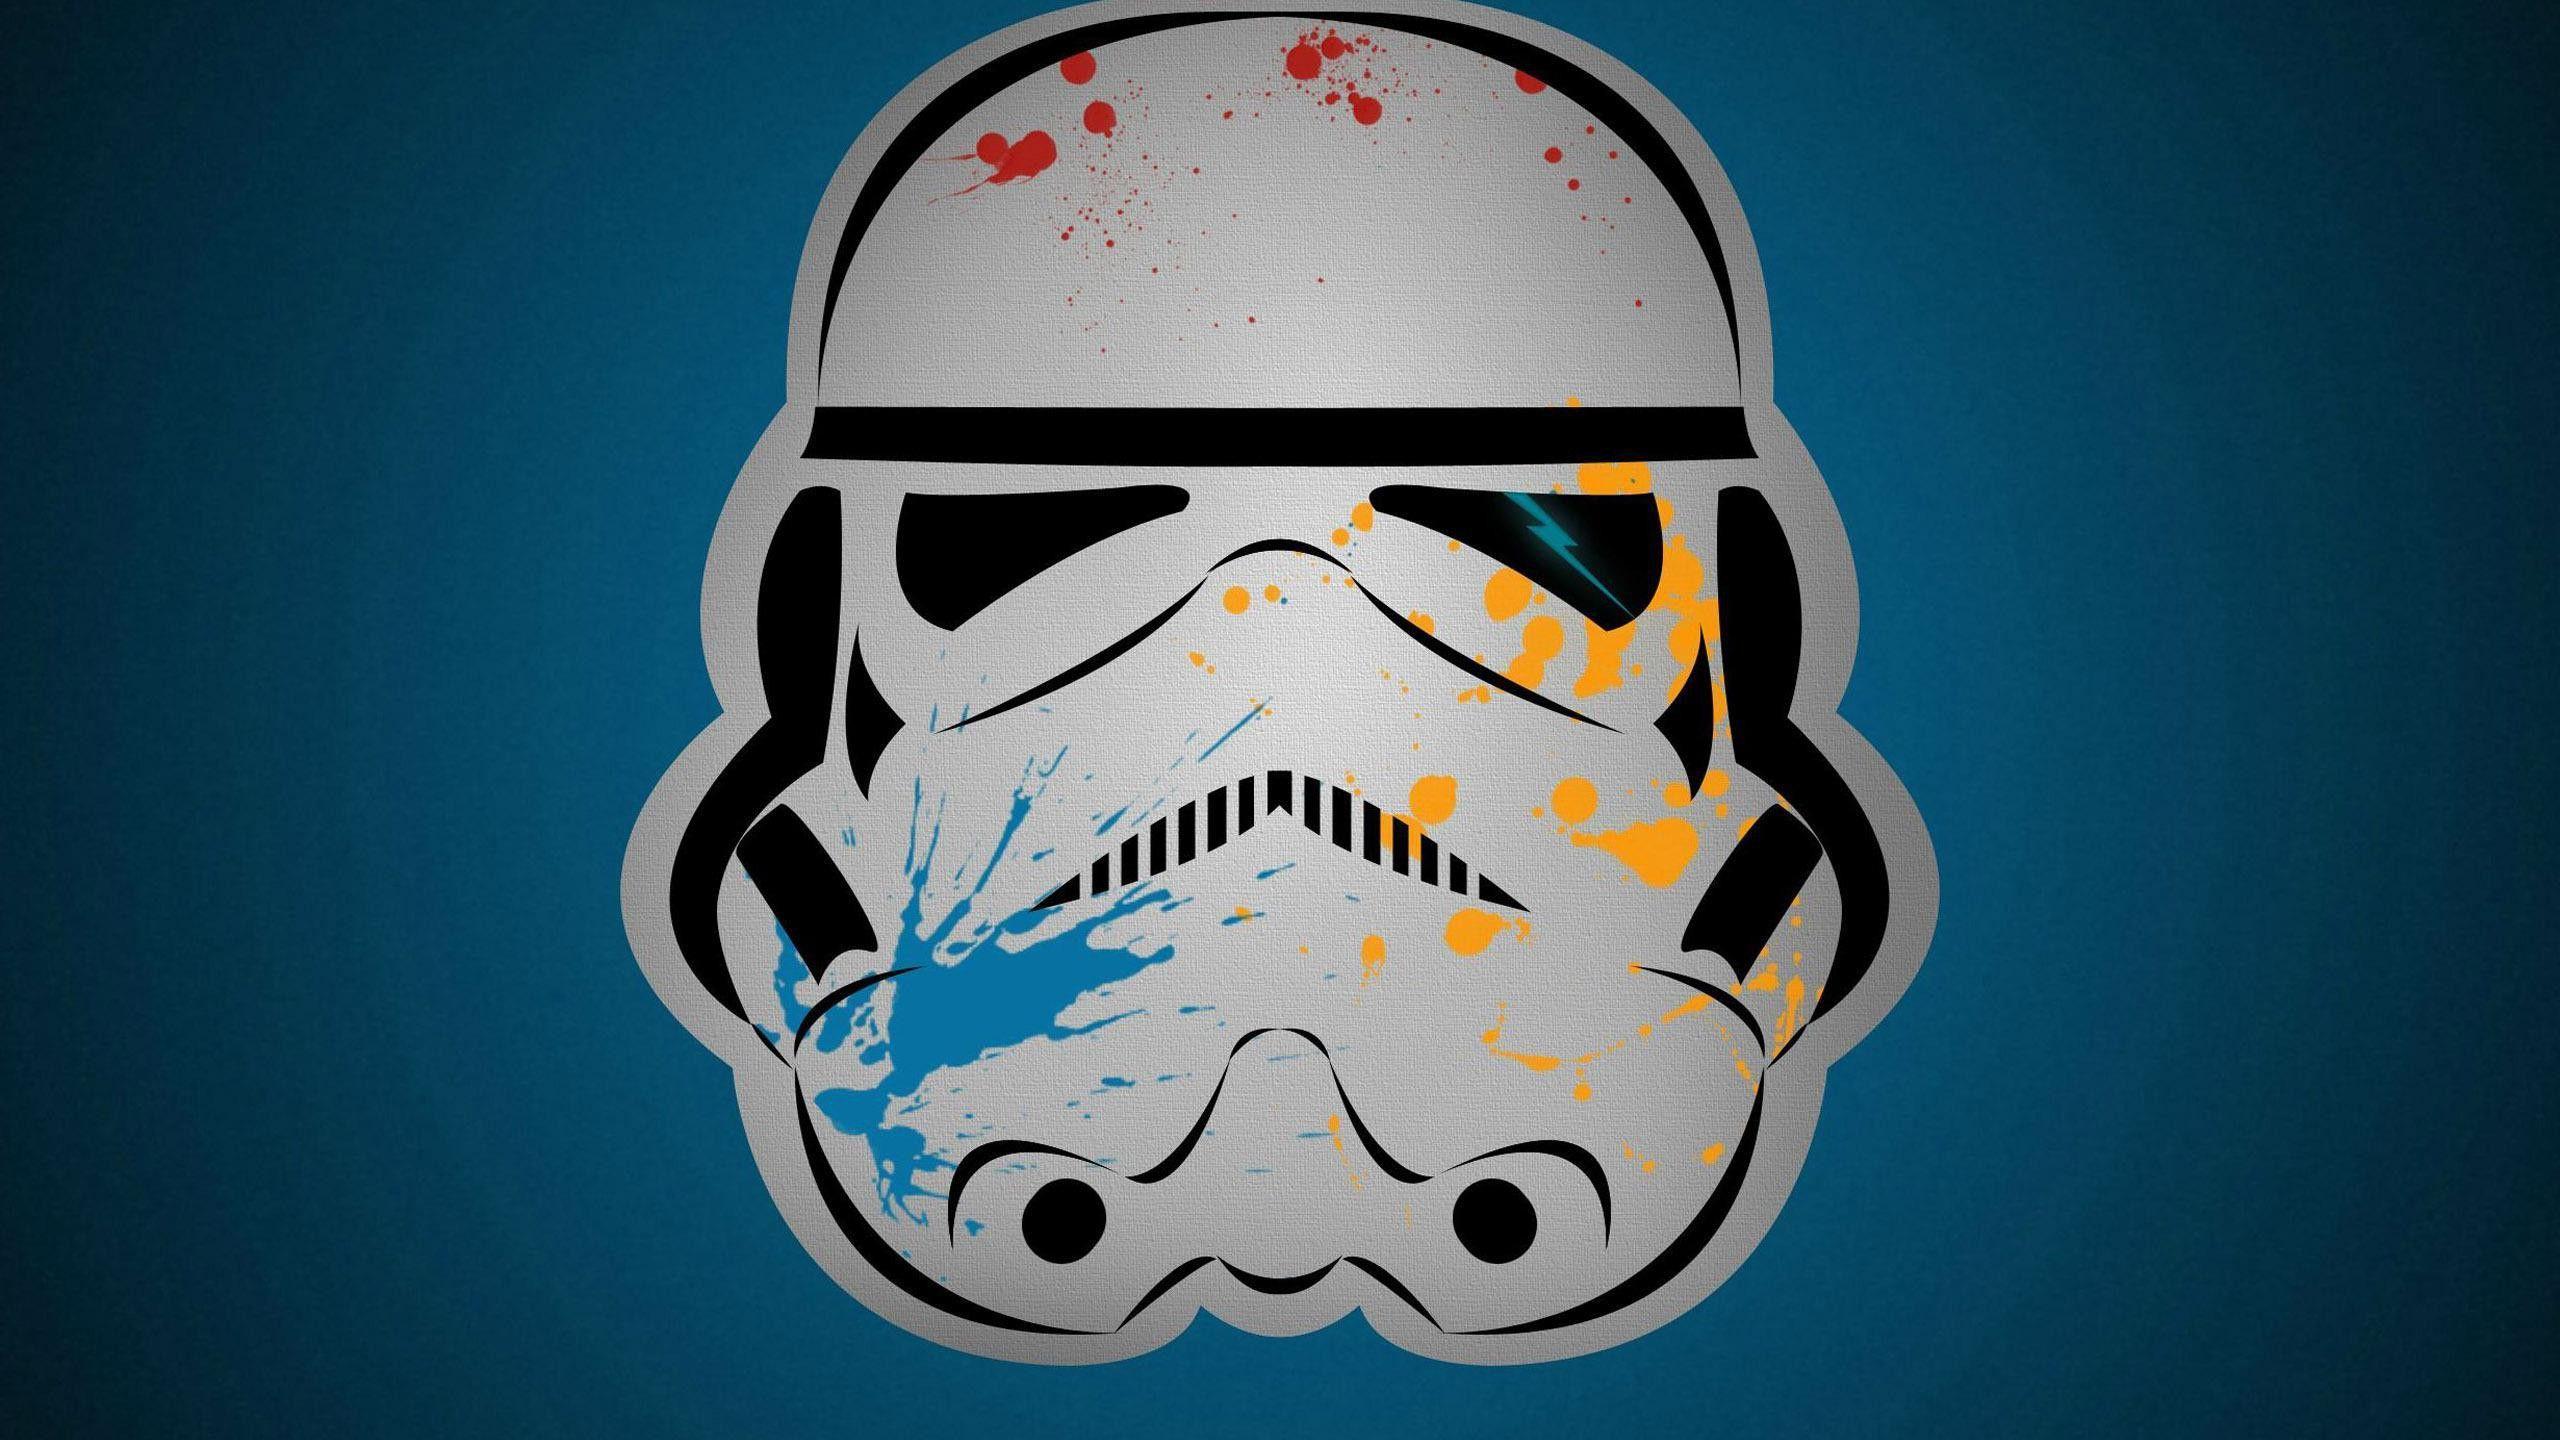 Hipster Star Wars Desktop Wallpapers Top Free Hipster Star Wars Desktop Backgrounds Wallpaperaccess